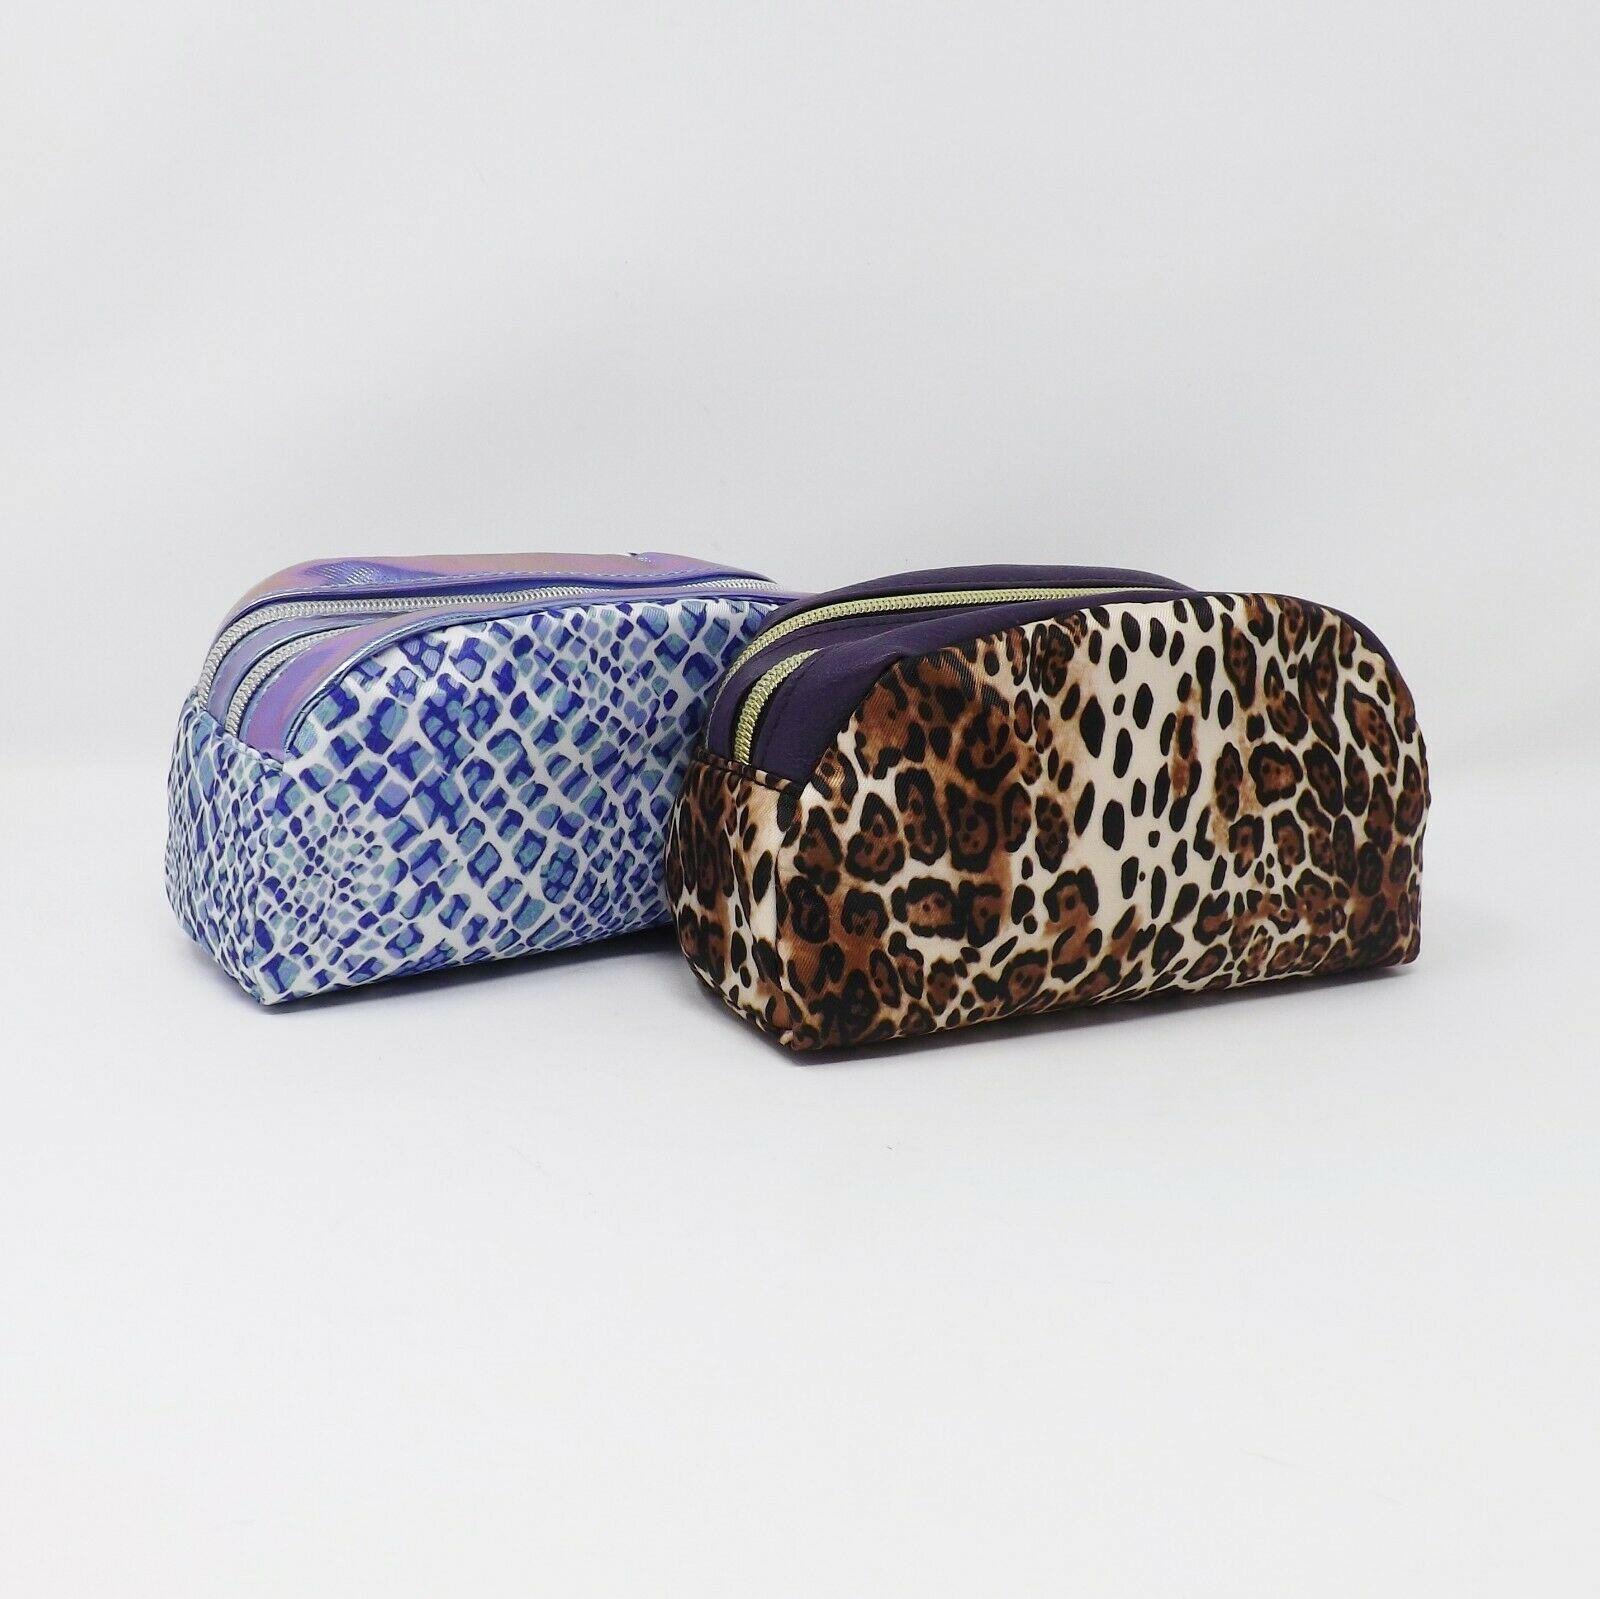 Adrienne Vittadini Studio Double Zippered Cosmetic Travel Case Bag - New